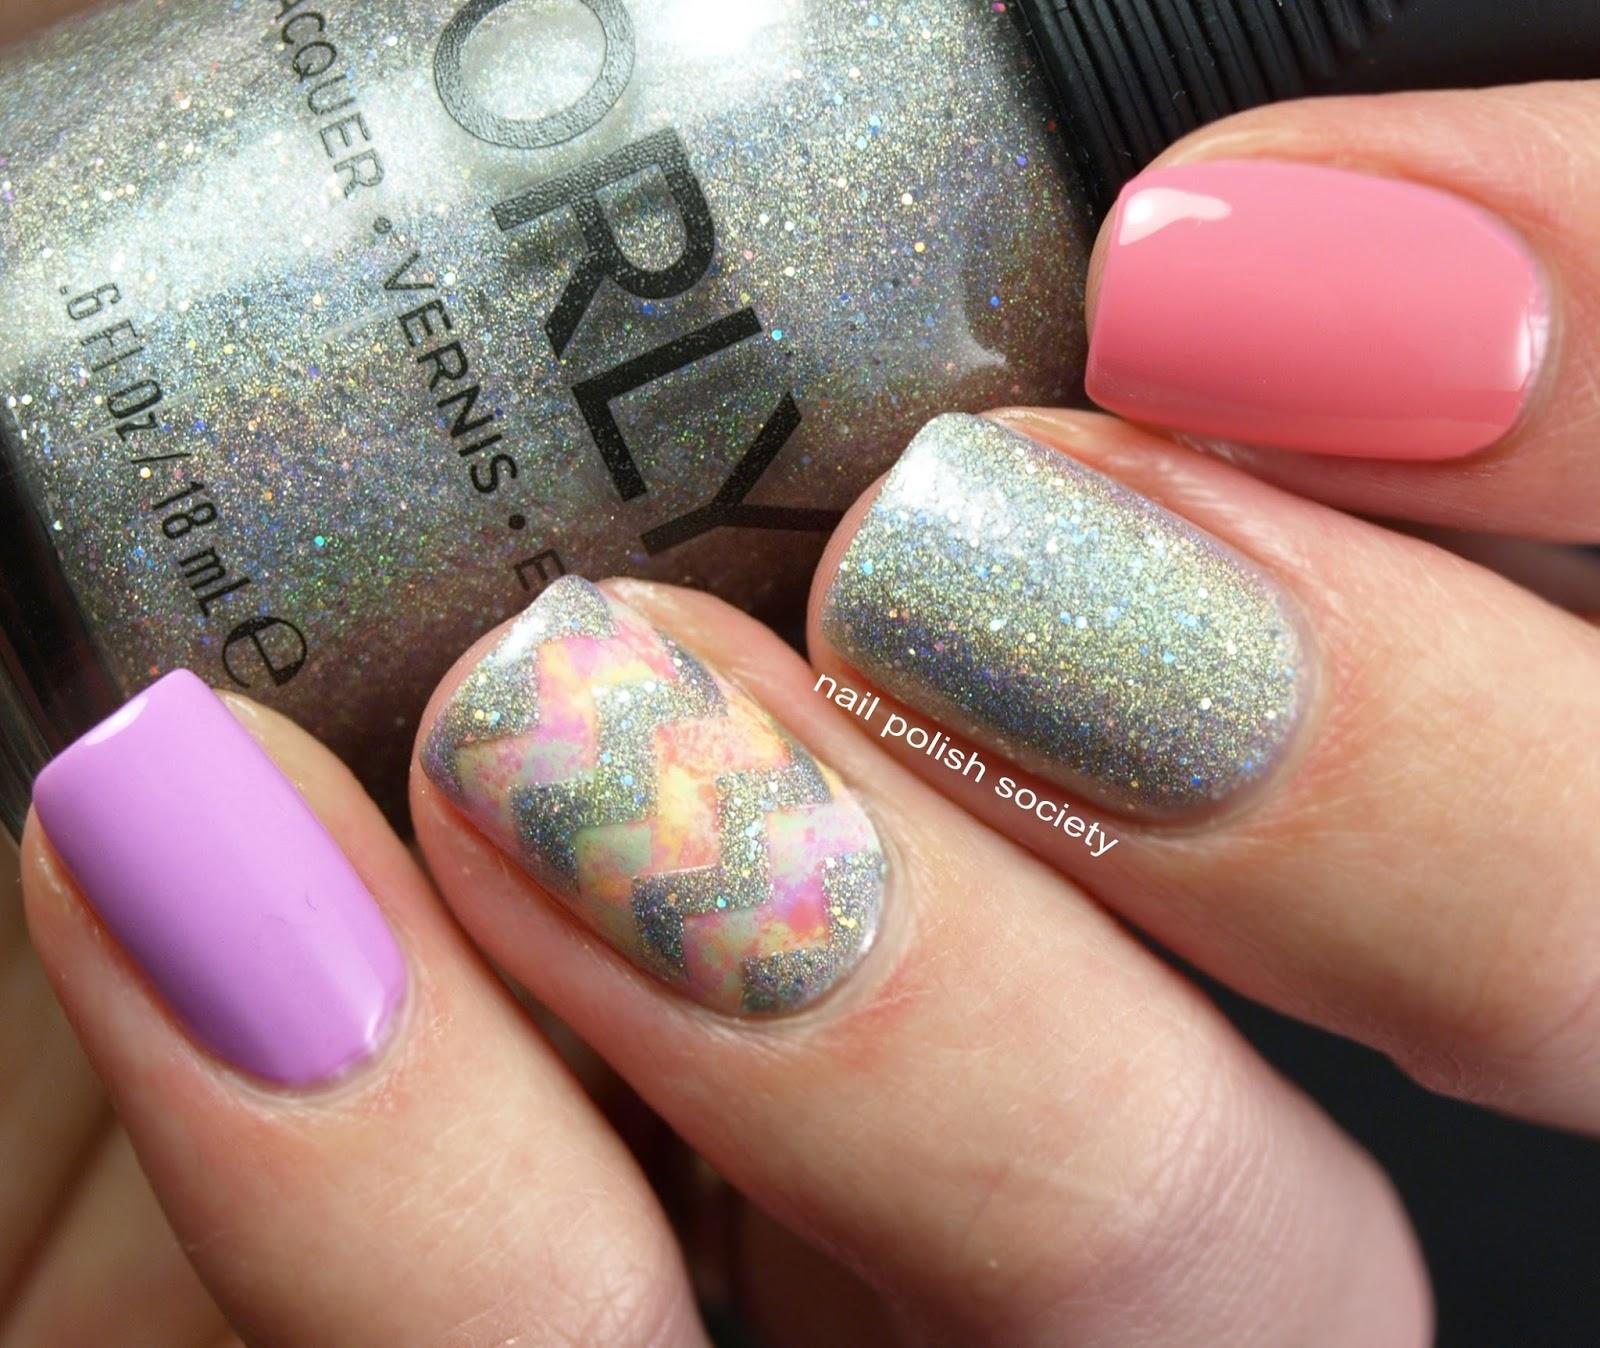 Nail Polish Society: Orly Mirrorball Springtime Skittle